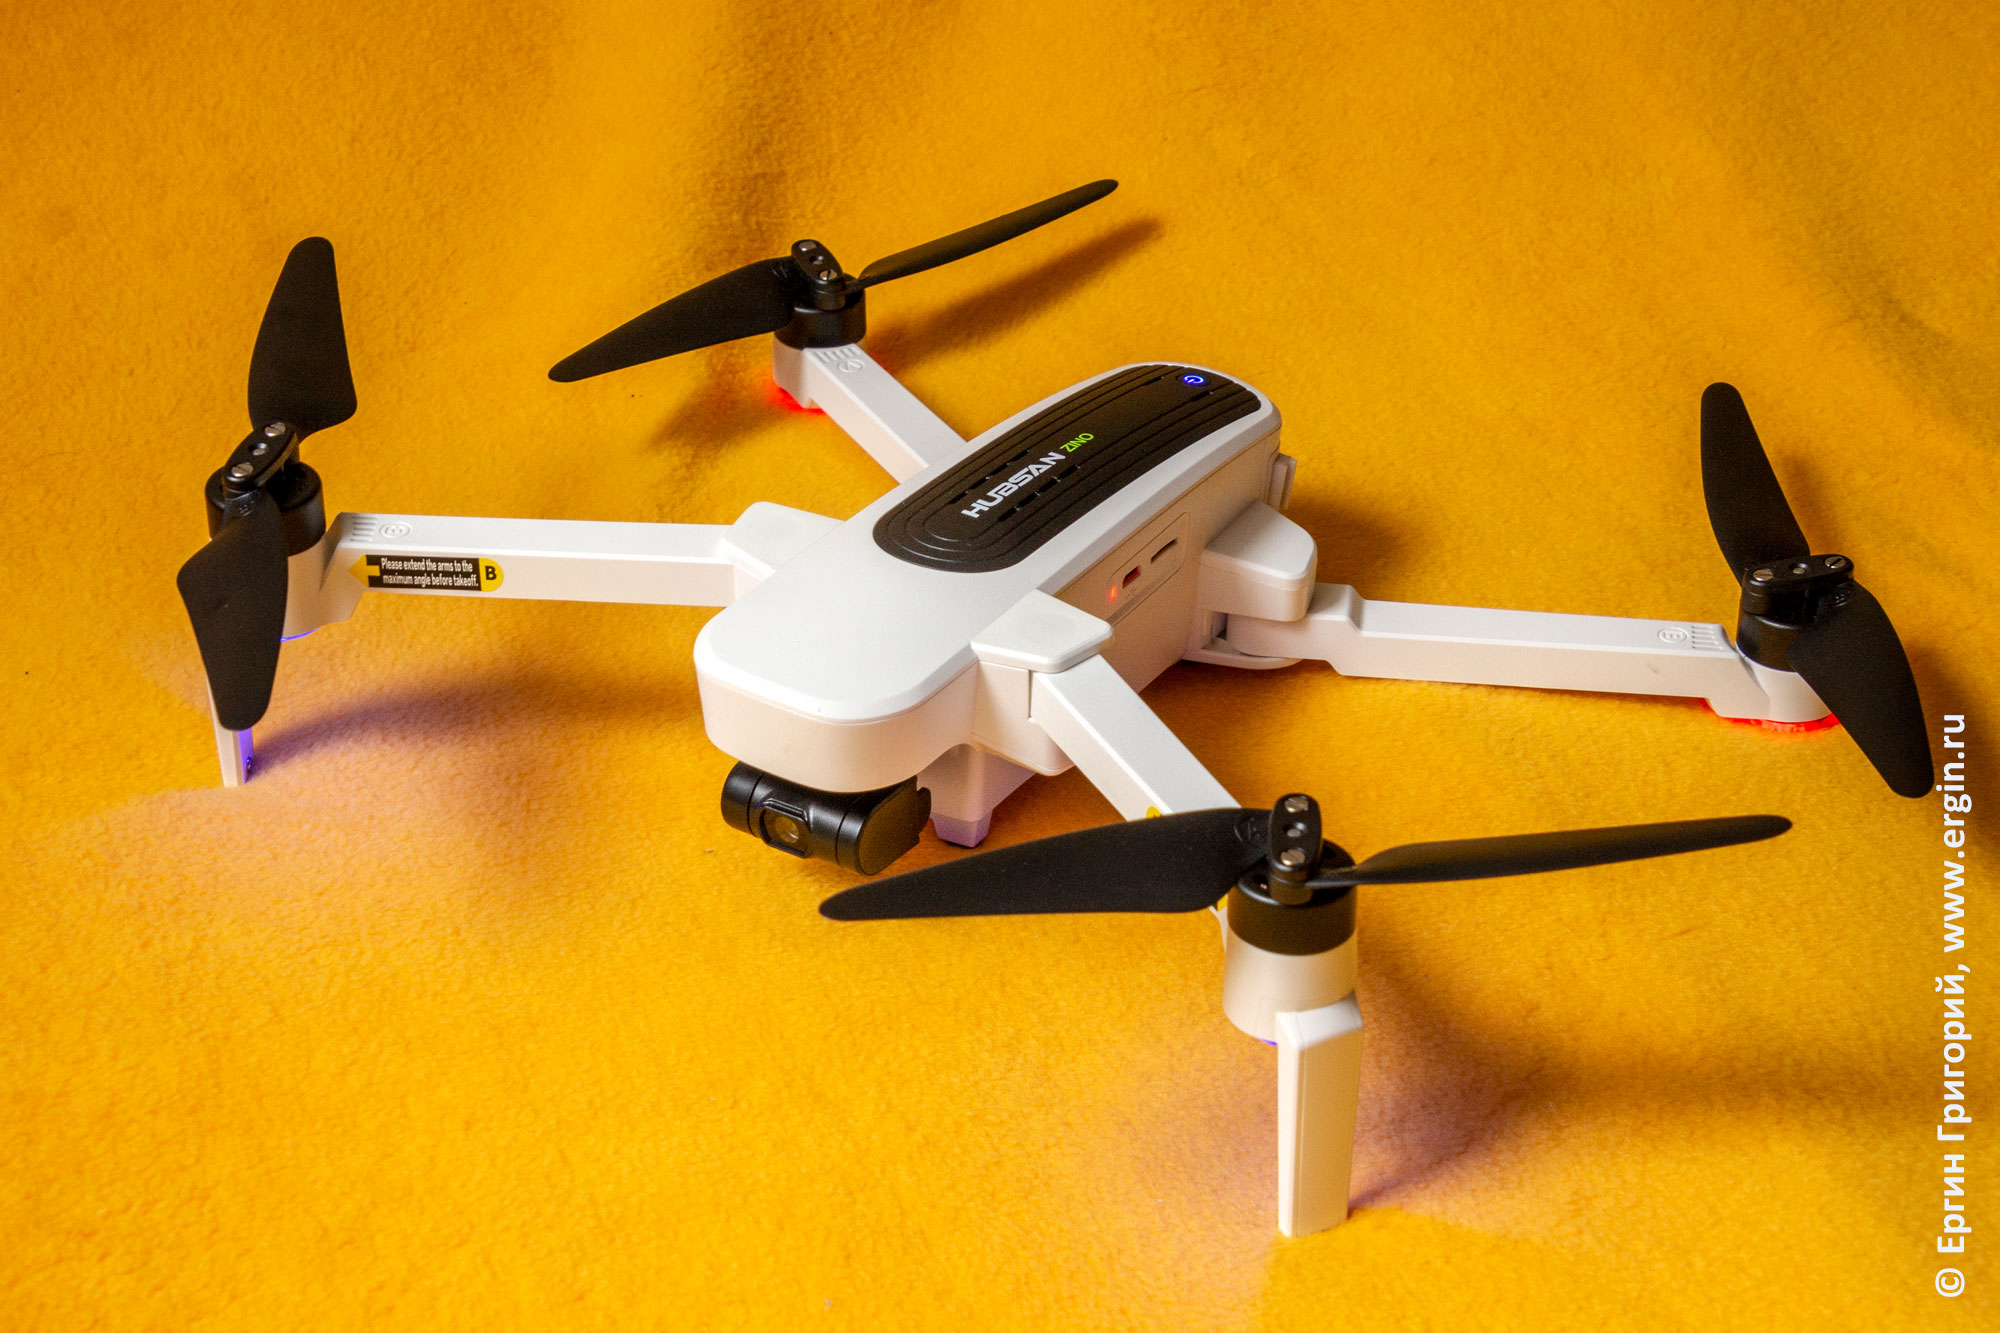 Обзор квадрокоптера дрона Hubsan Zino H117S